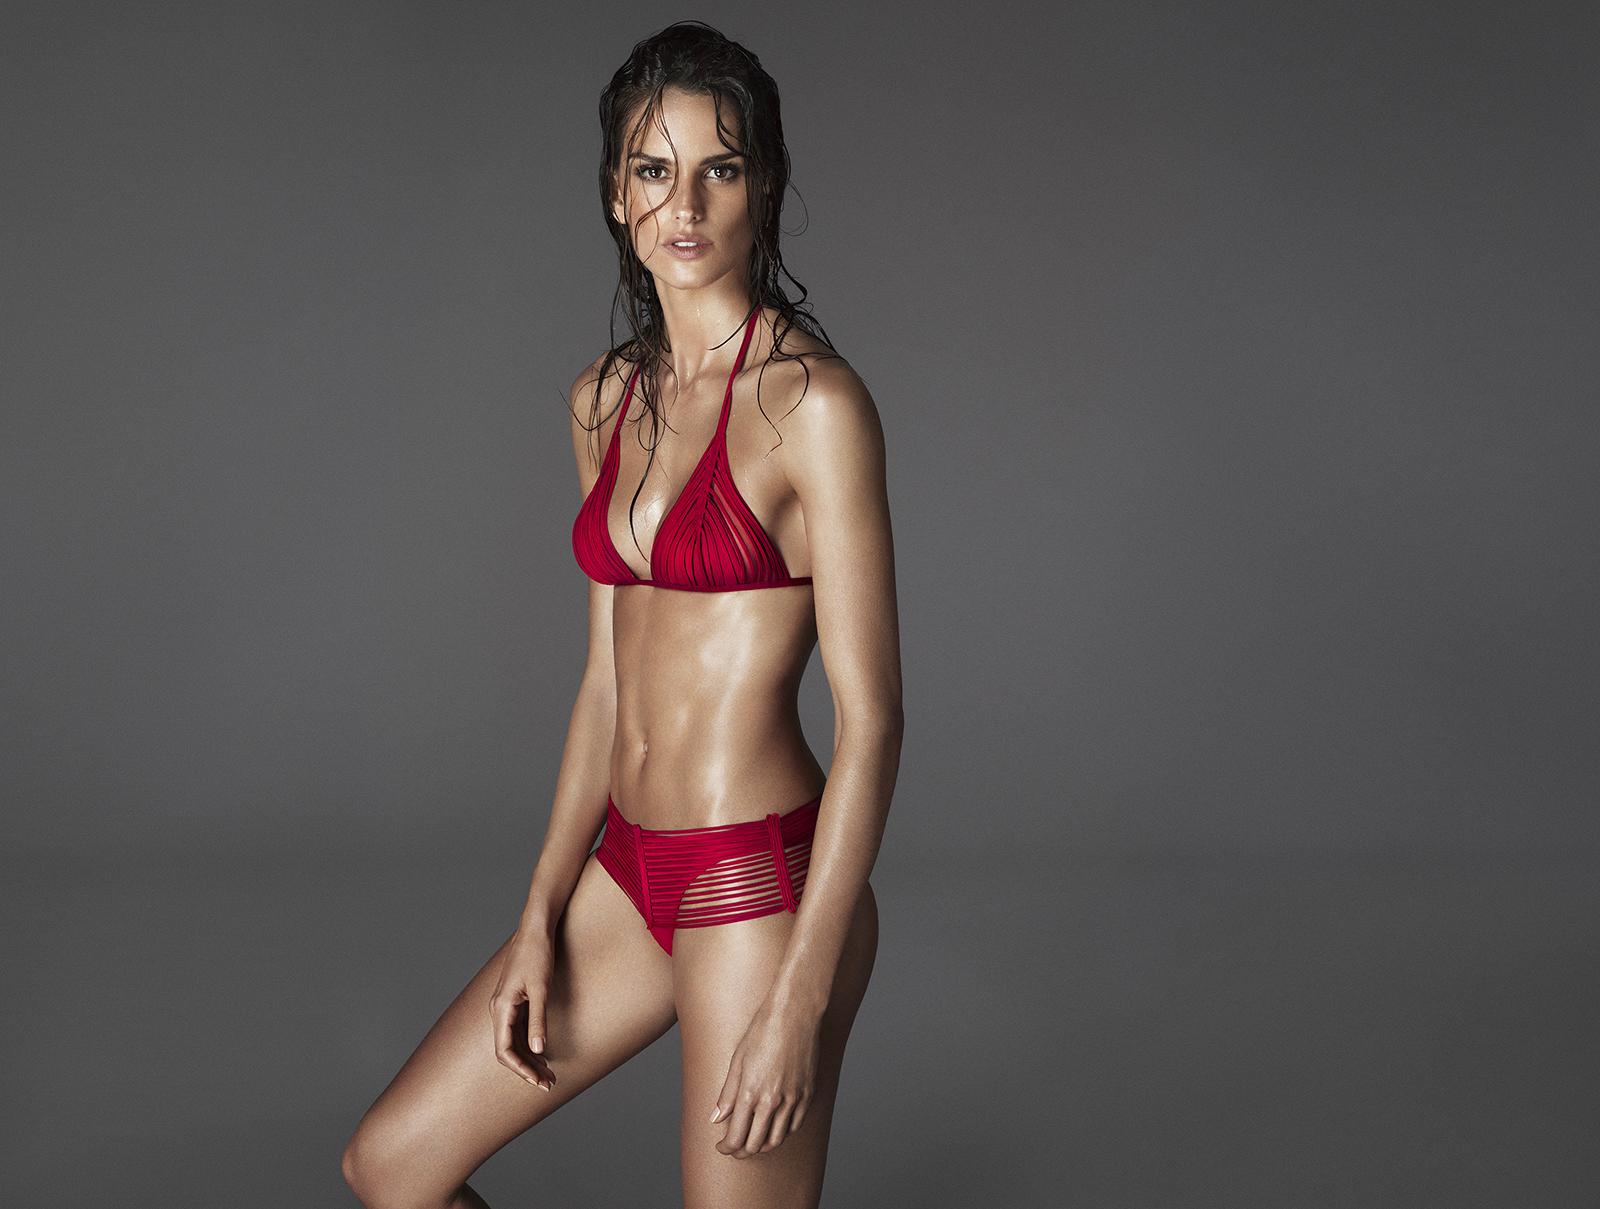 factory authentic half price in stock La Perla presents SS15 lingerie, nightwear and beachwear ...